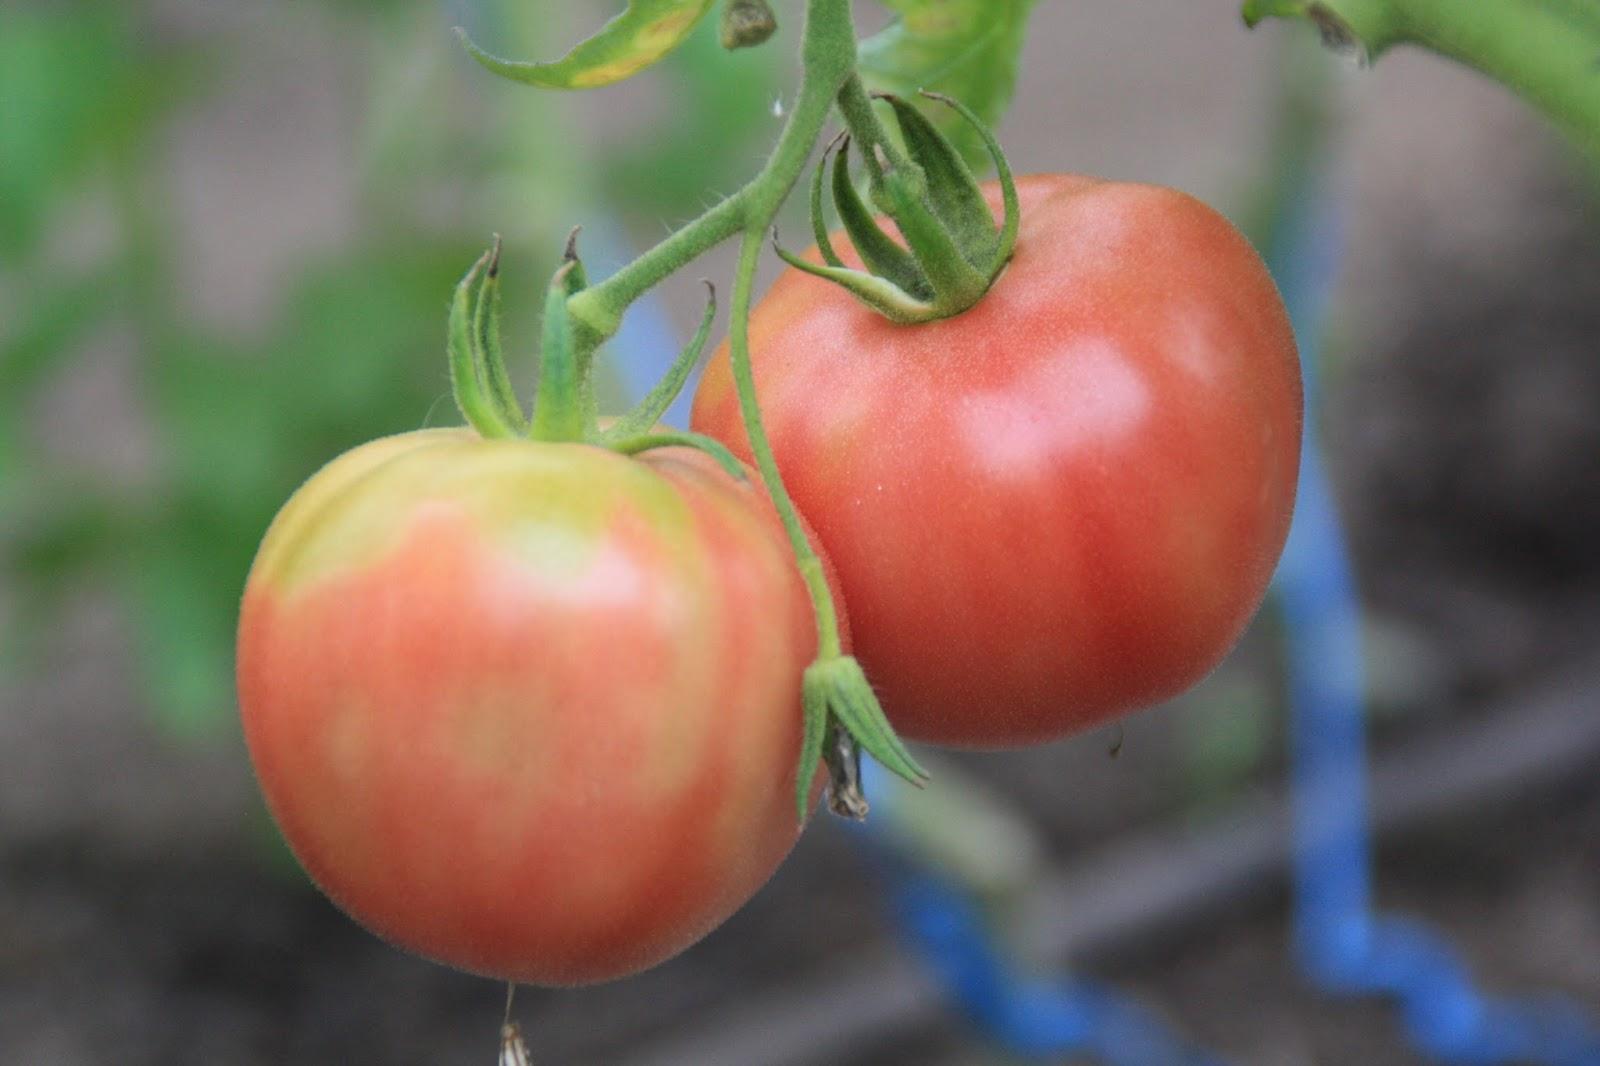 bosavern community farm tomato varieties 2016. Black Bedroom Furniture Sets. Home Design Ideas